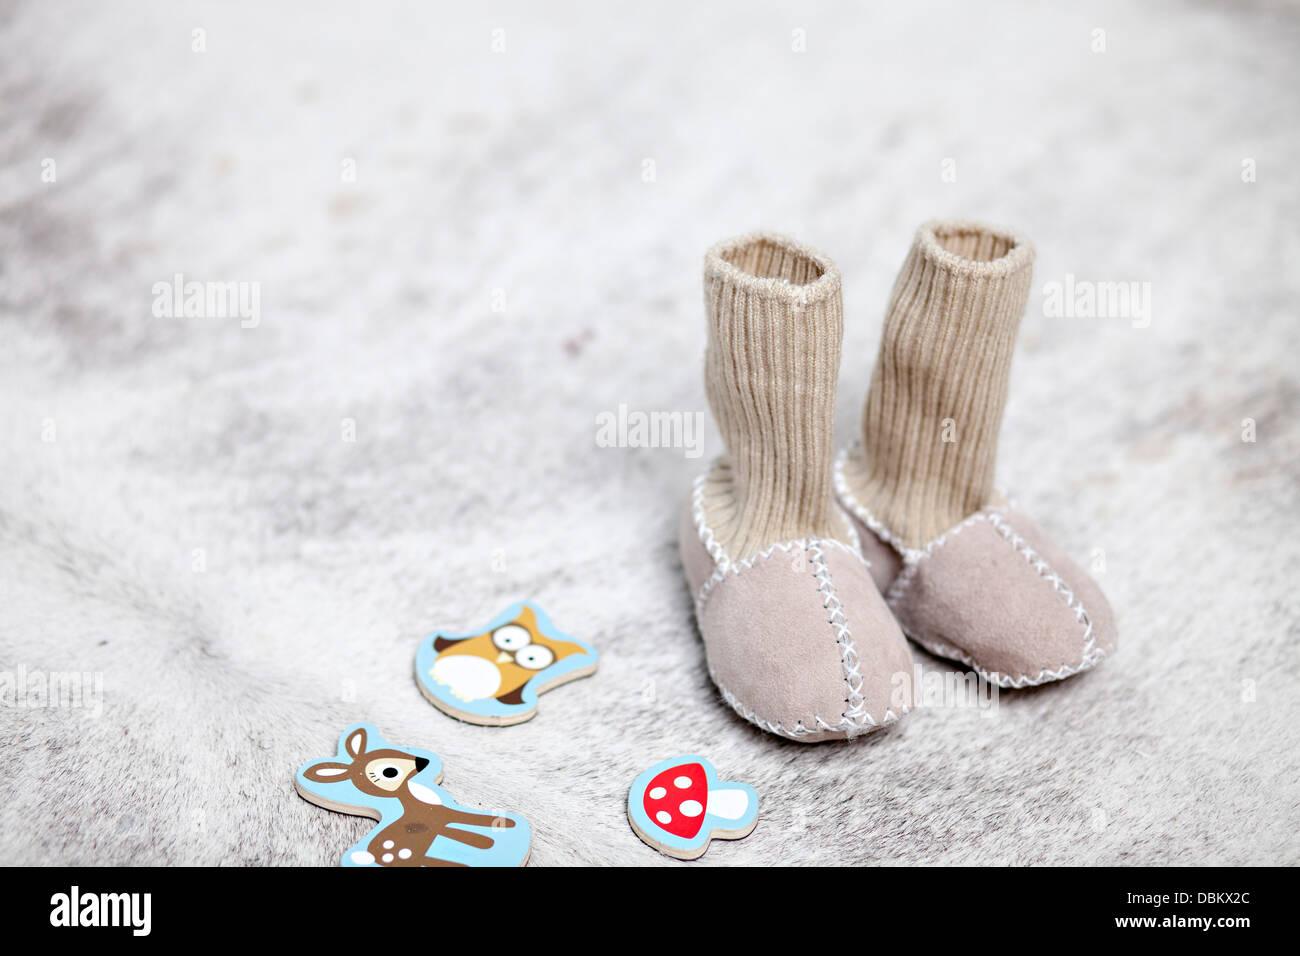 Slipper Socks And Toys, Munich, Bavaria, Germany - Stock Image